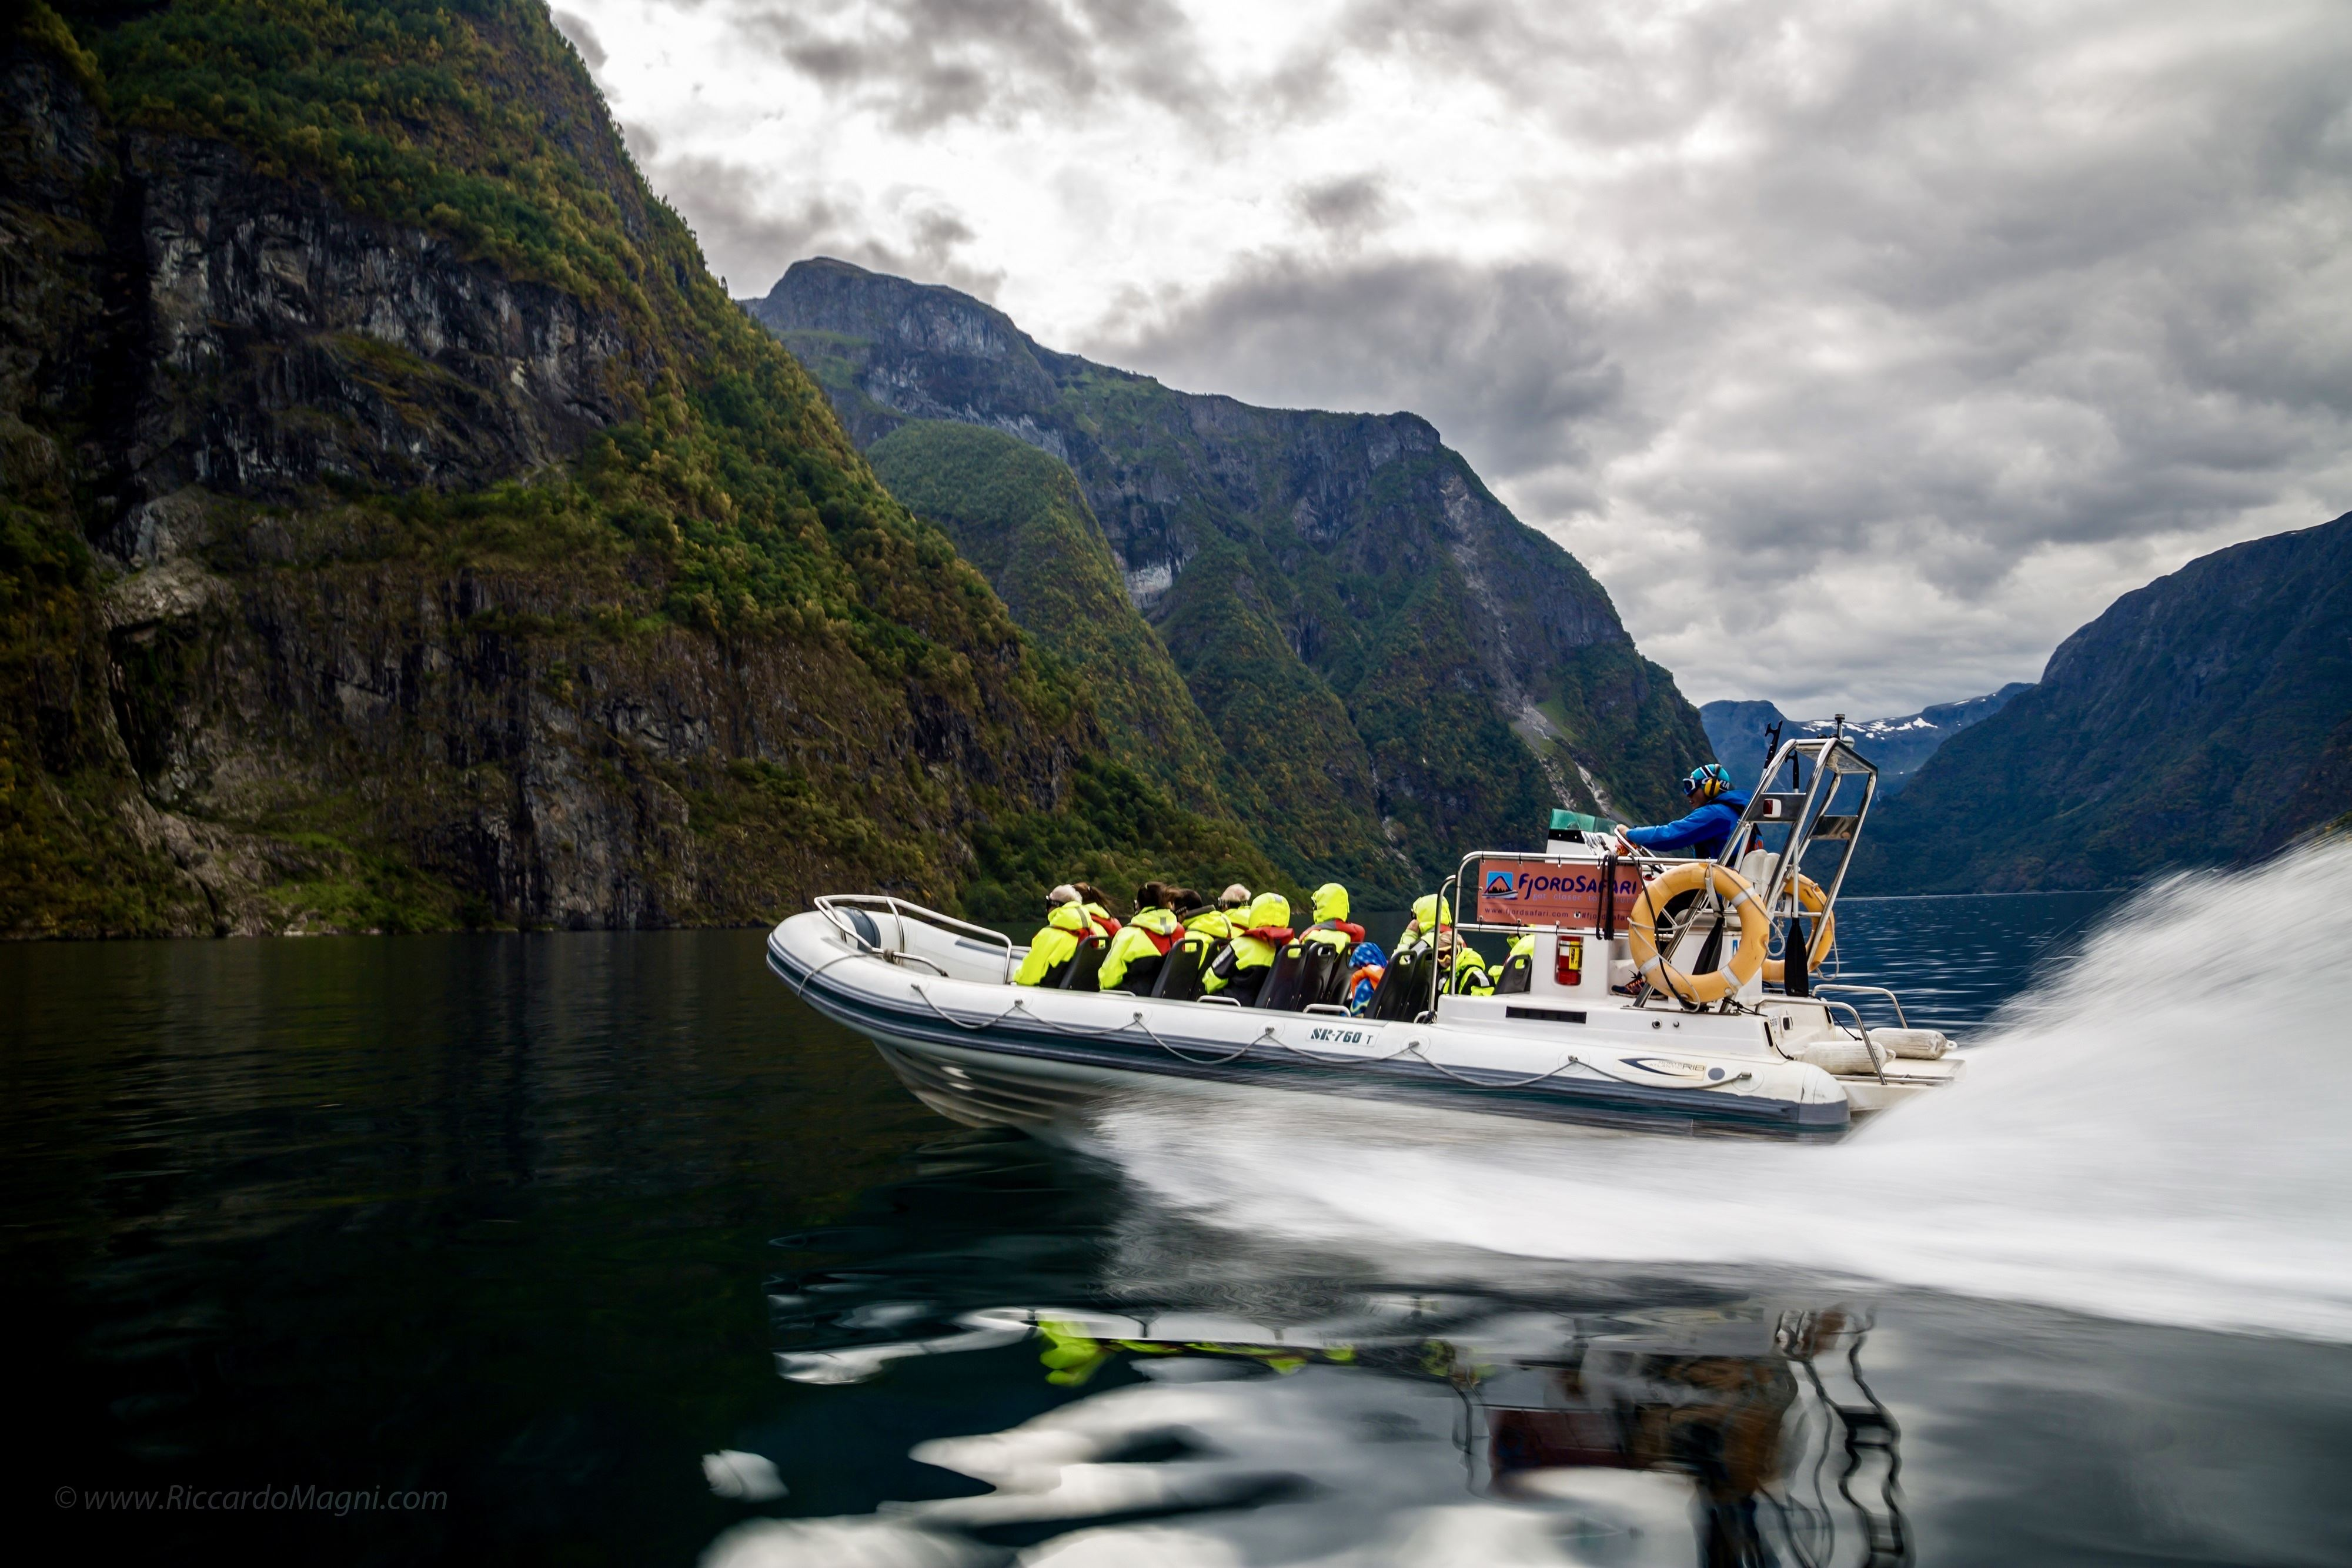 © Reccardo Magni, Heritage FjordSafari